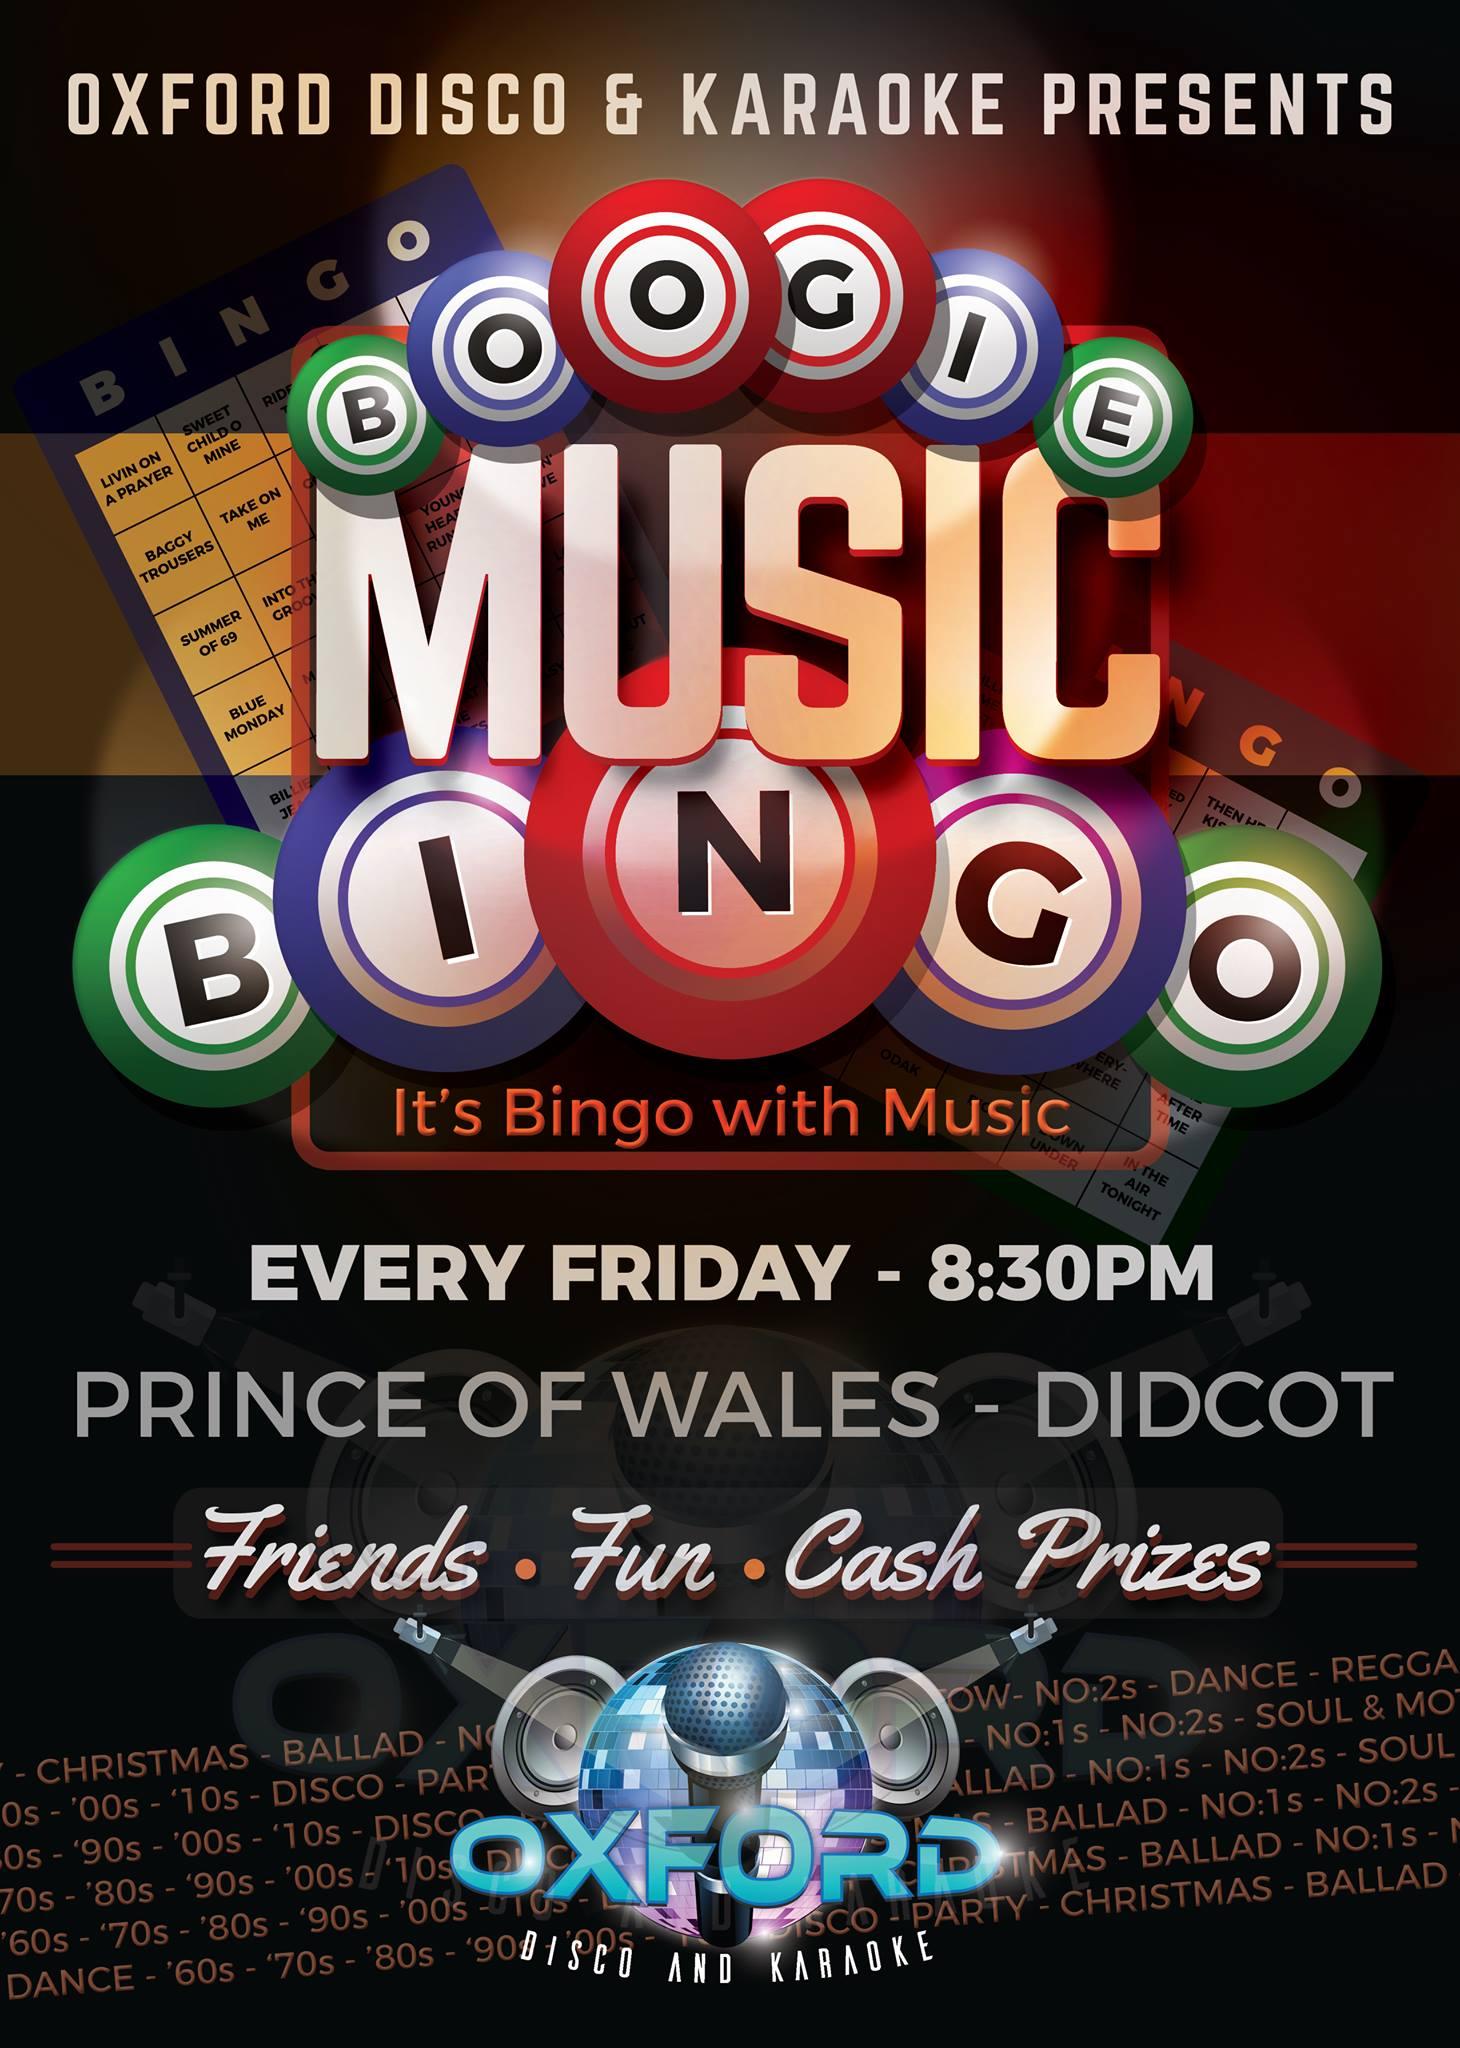 Oxford Disco and Karaoke in Oxfordshire - Boogie Music Bingo Poster